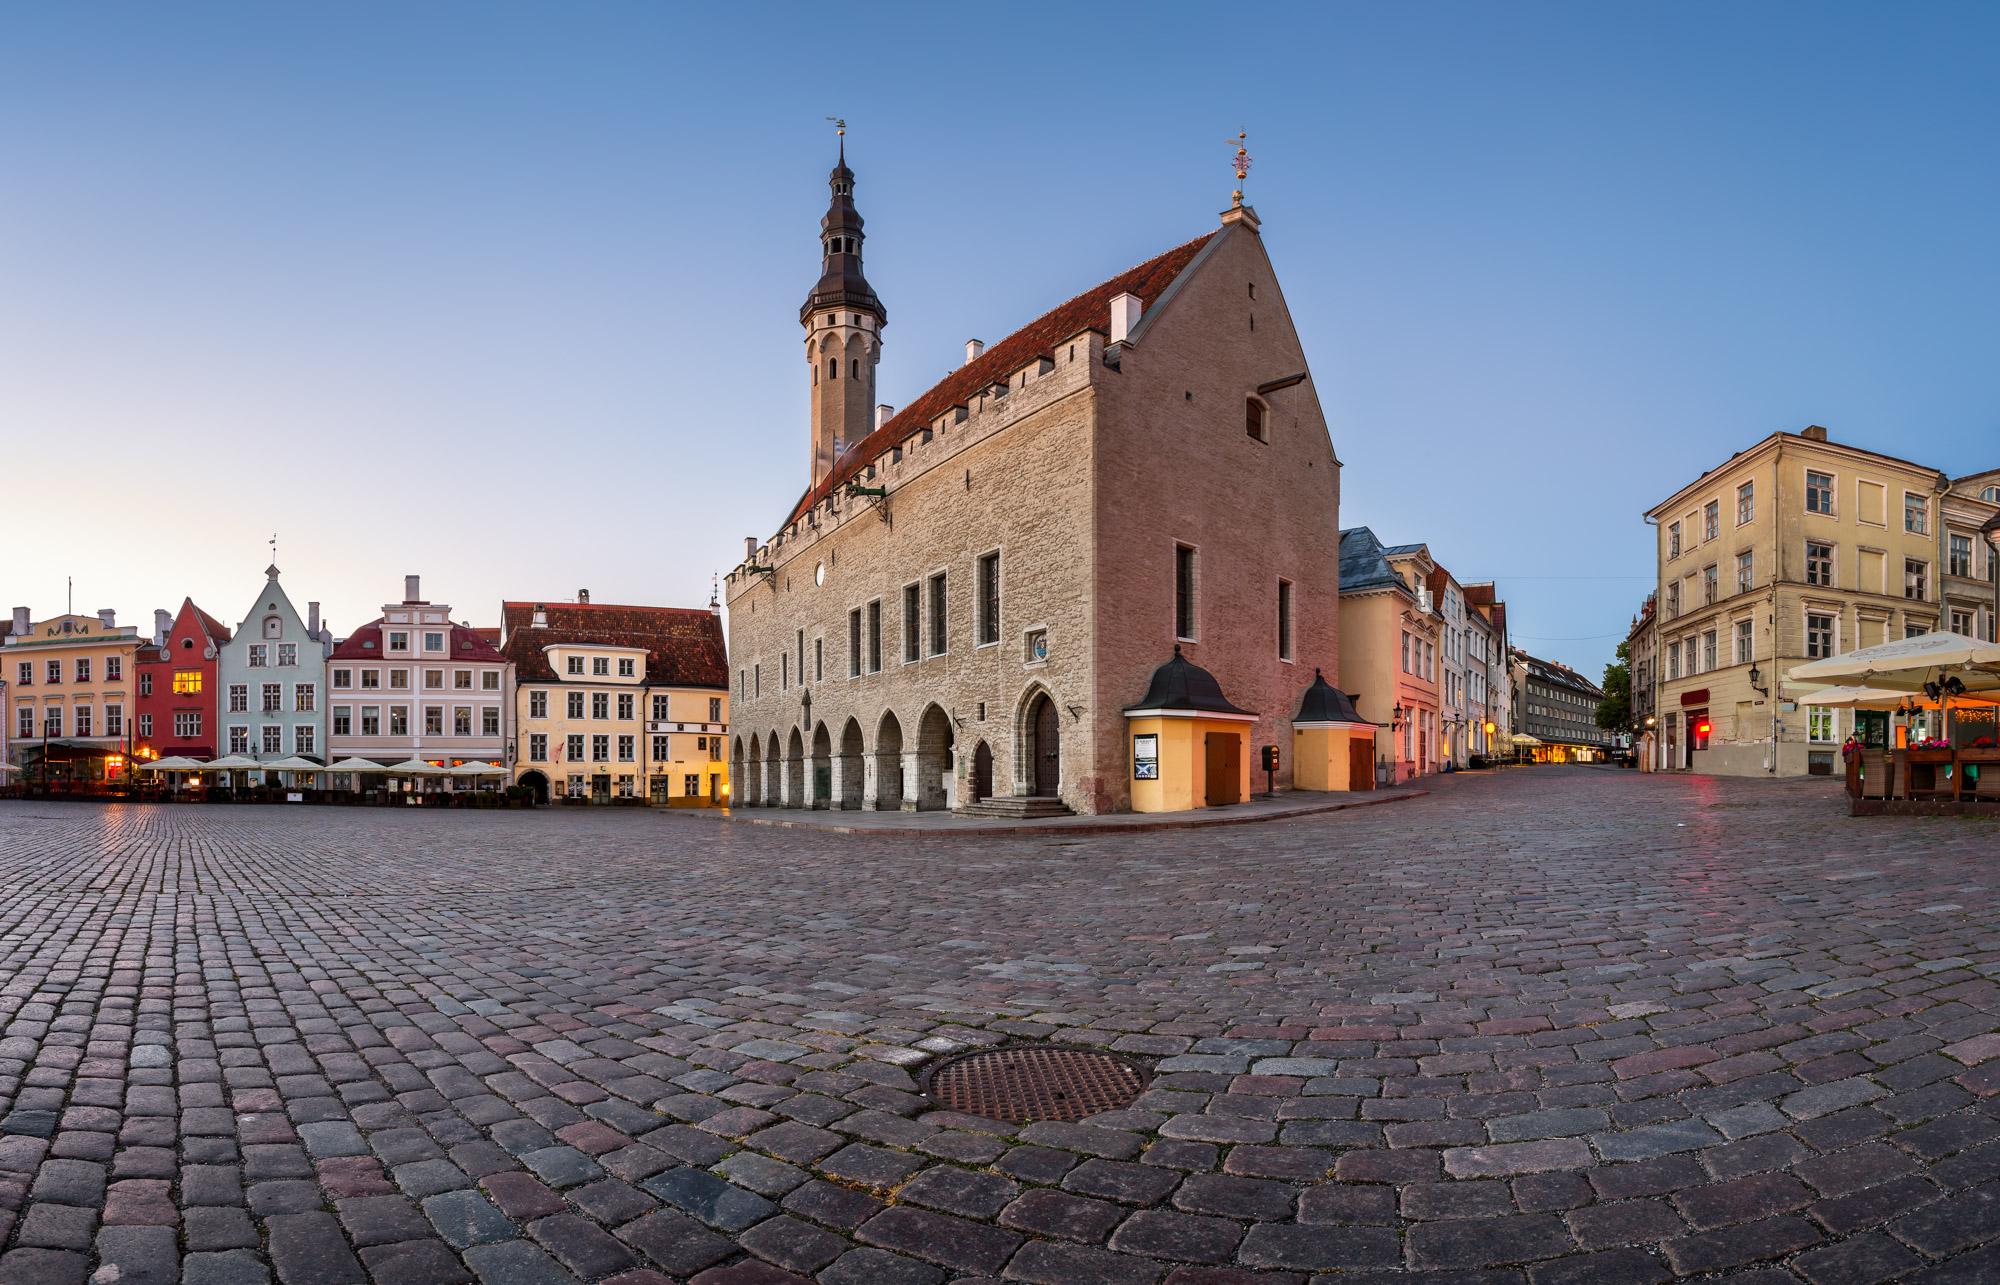 Town Hall and Raekoja Square, Tallinn, Estonia